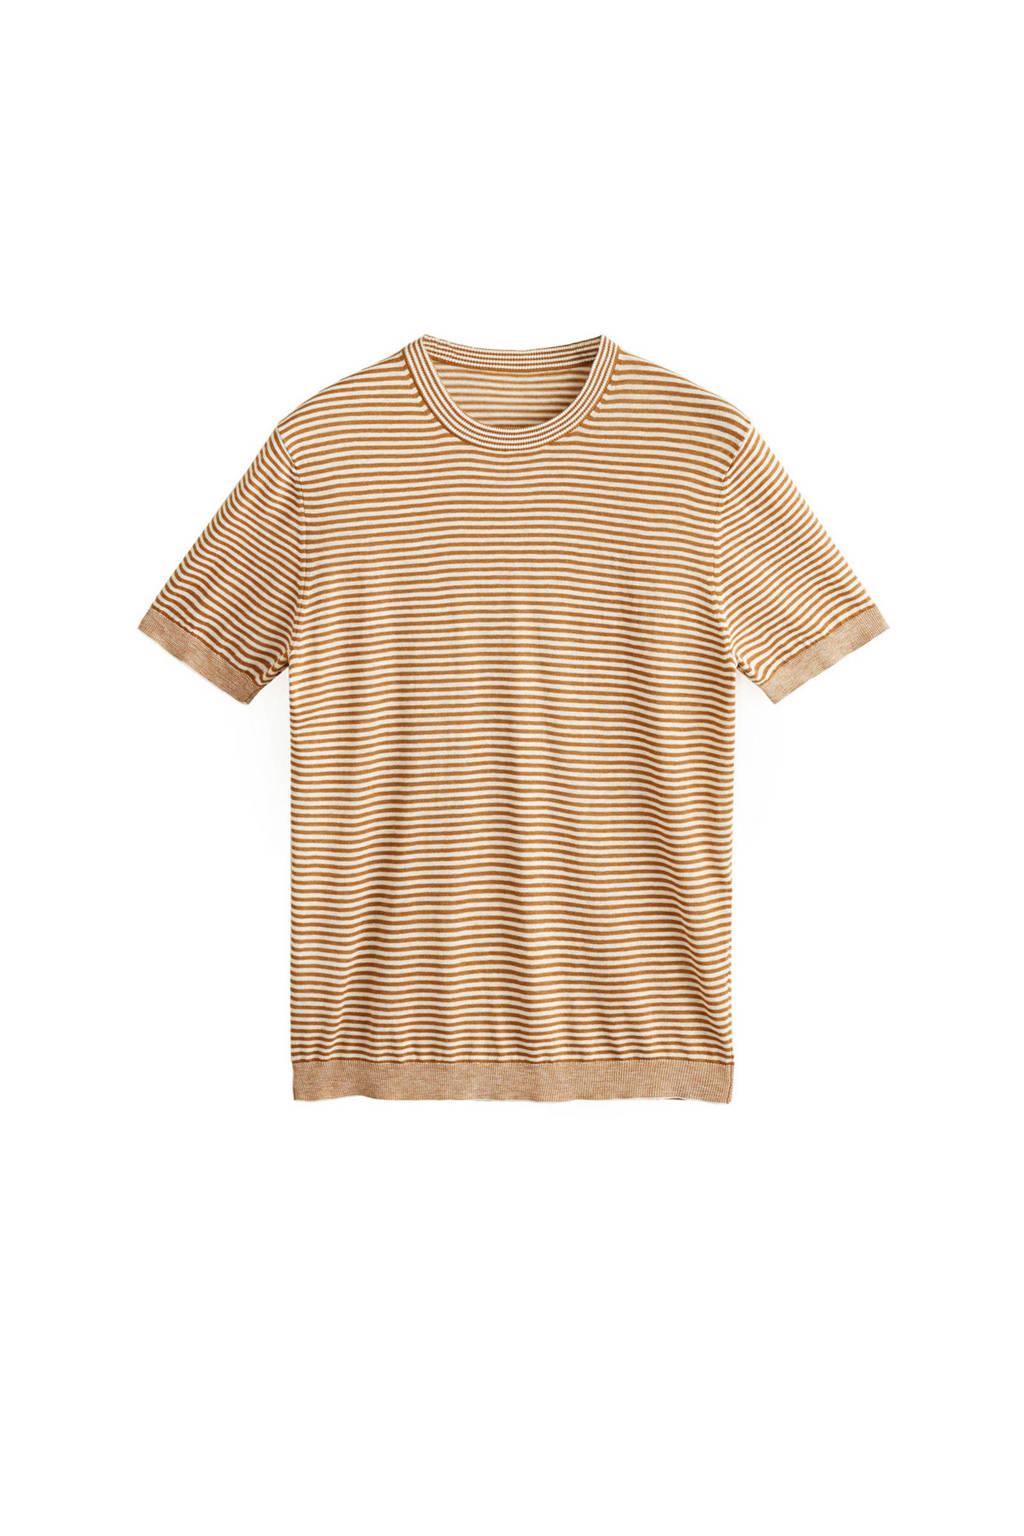 Mango Man fijn gebreid T-shirt met streep, middenoranje